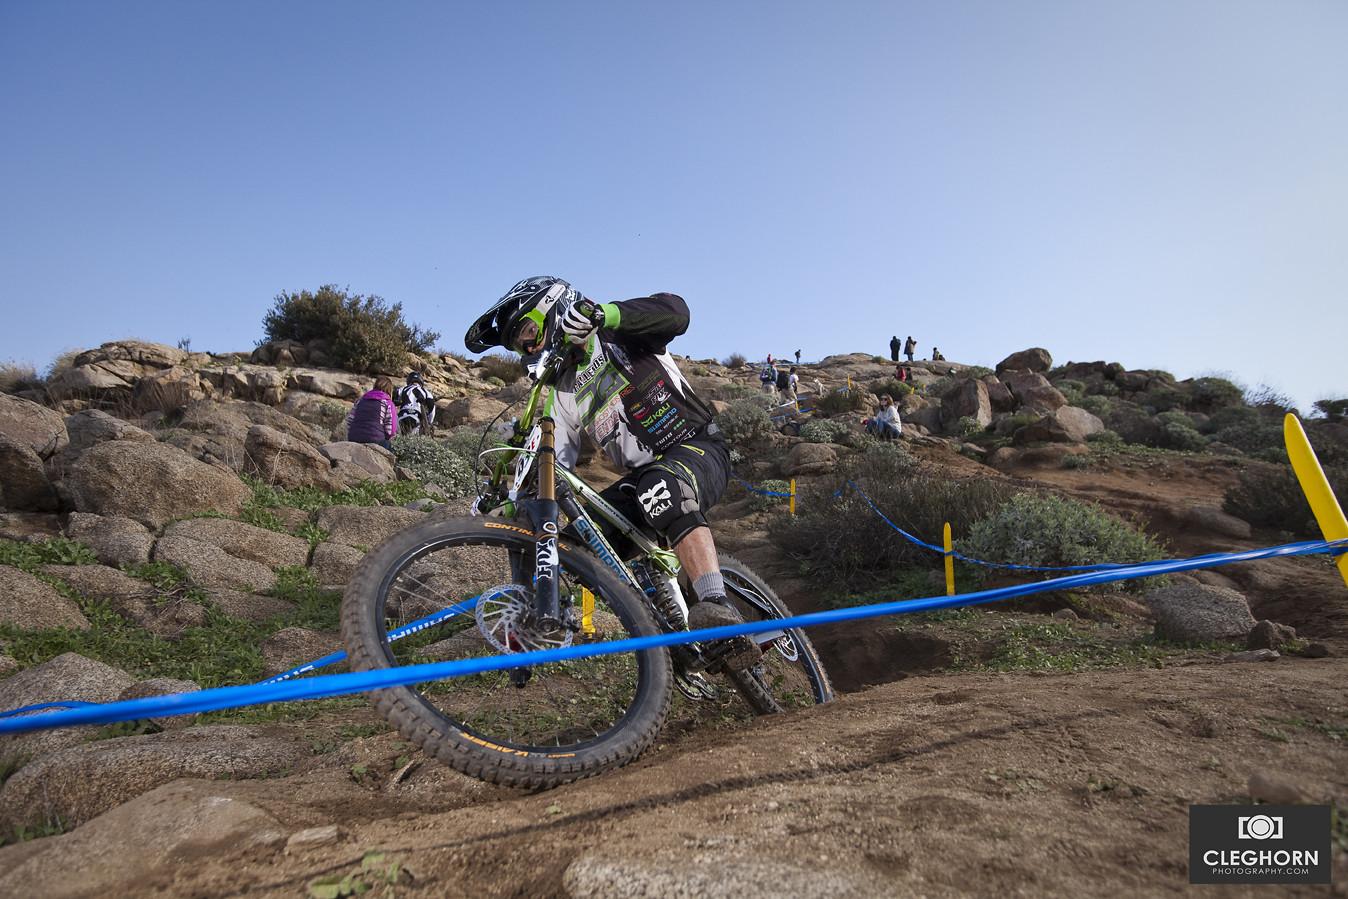 Chris Wacey Calleros - Cleghorn Photography - Mountain Biking Pictures - Vital MTB